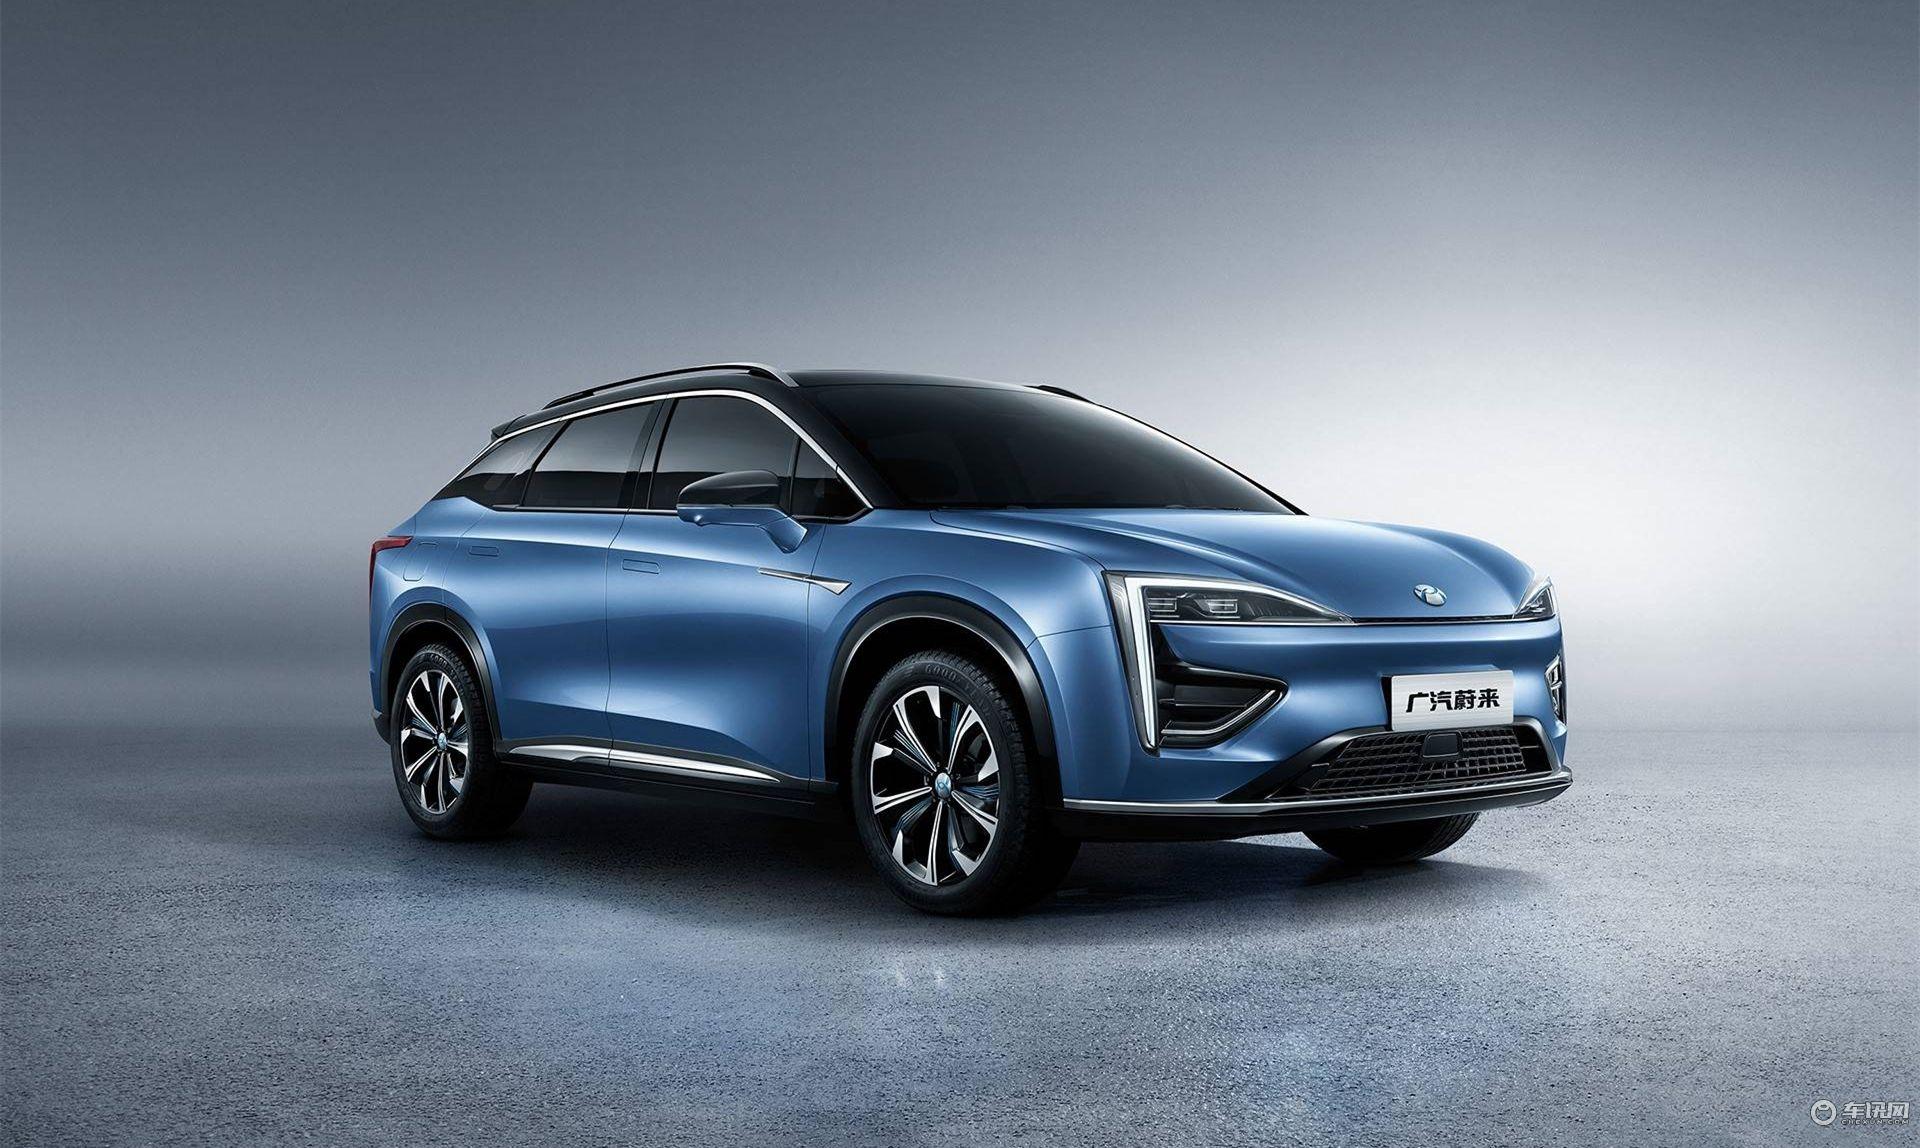 NEDC续航650km 广汽蔚来首款车型将于12月27日发布